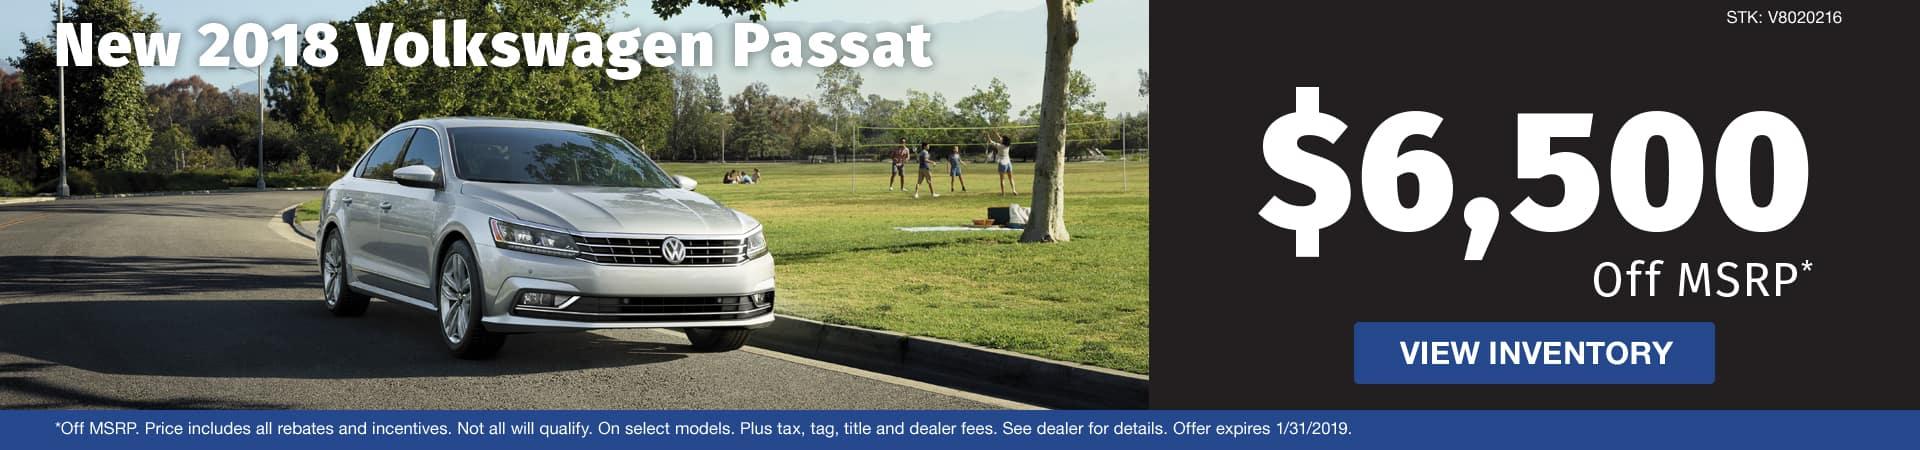 Save $6,500 off a new 2018 Volkswagen Passat model in Murfreesboro TN